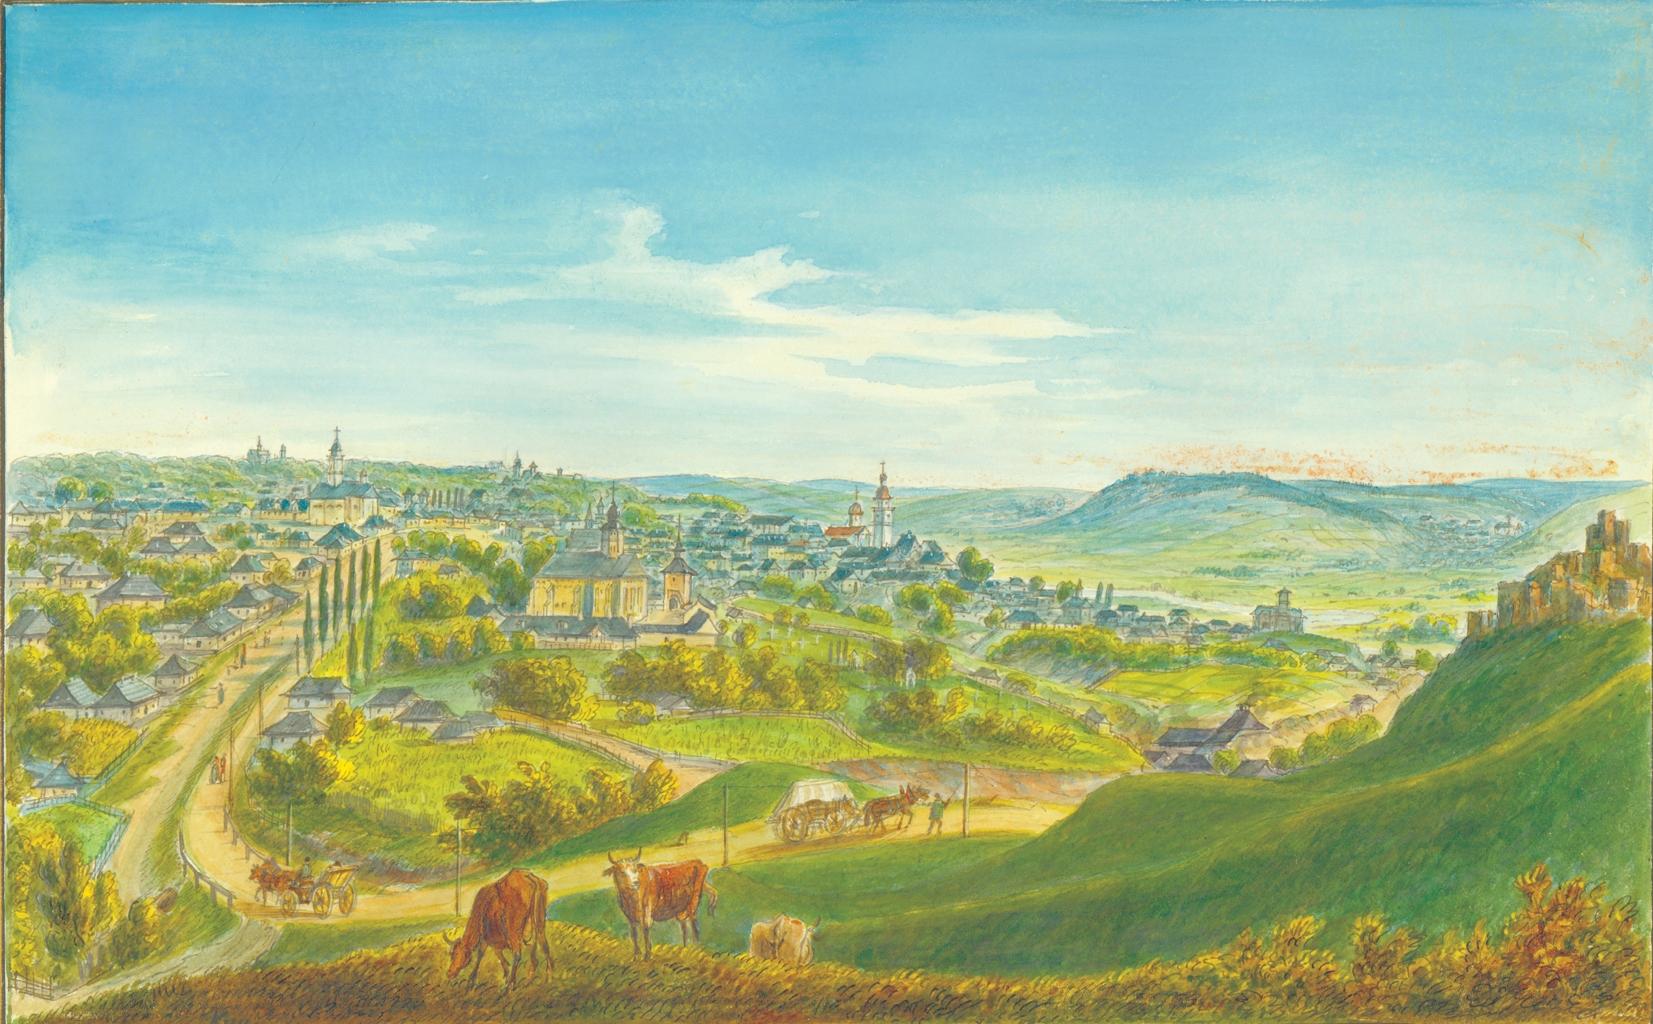 https://upload.wikimedia.org/wikipedia/commons/2/27/Franz_Xavier_Knapp_-_Gränz-Stadt_Suczarva.jpg